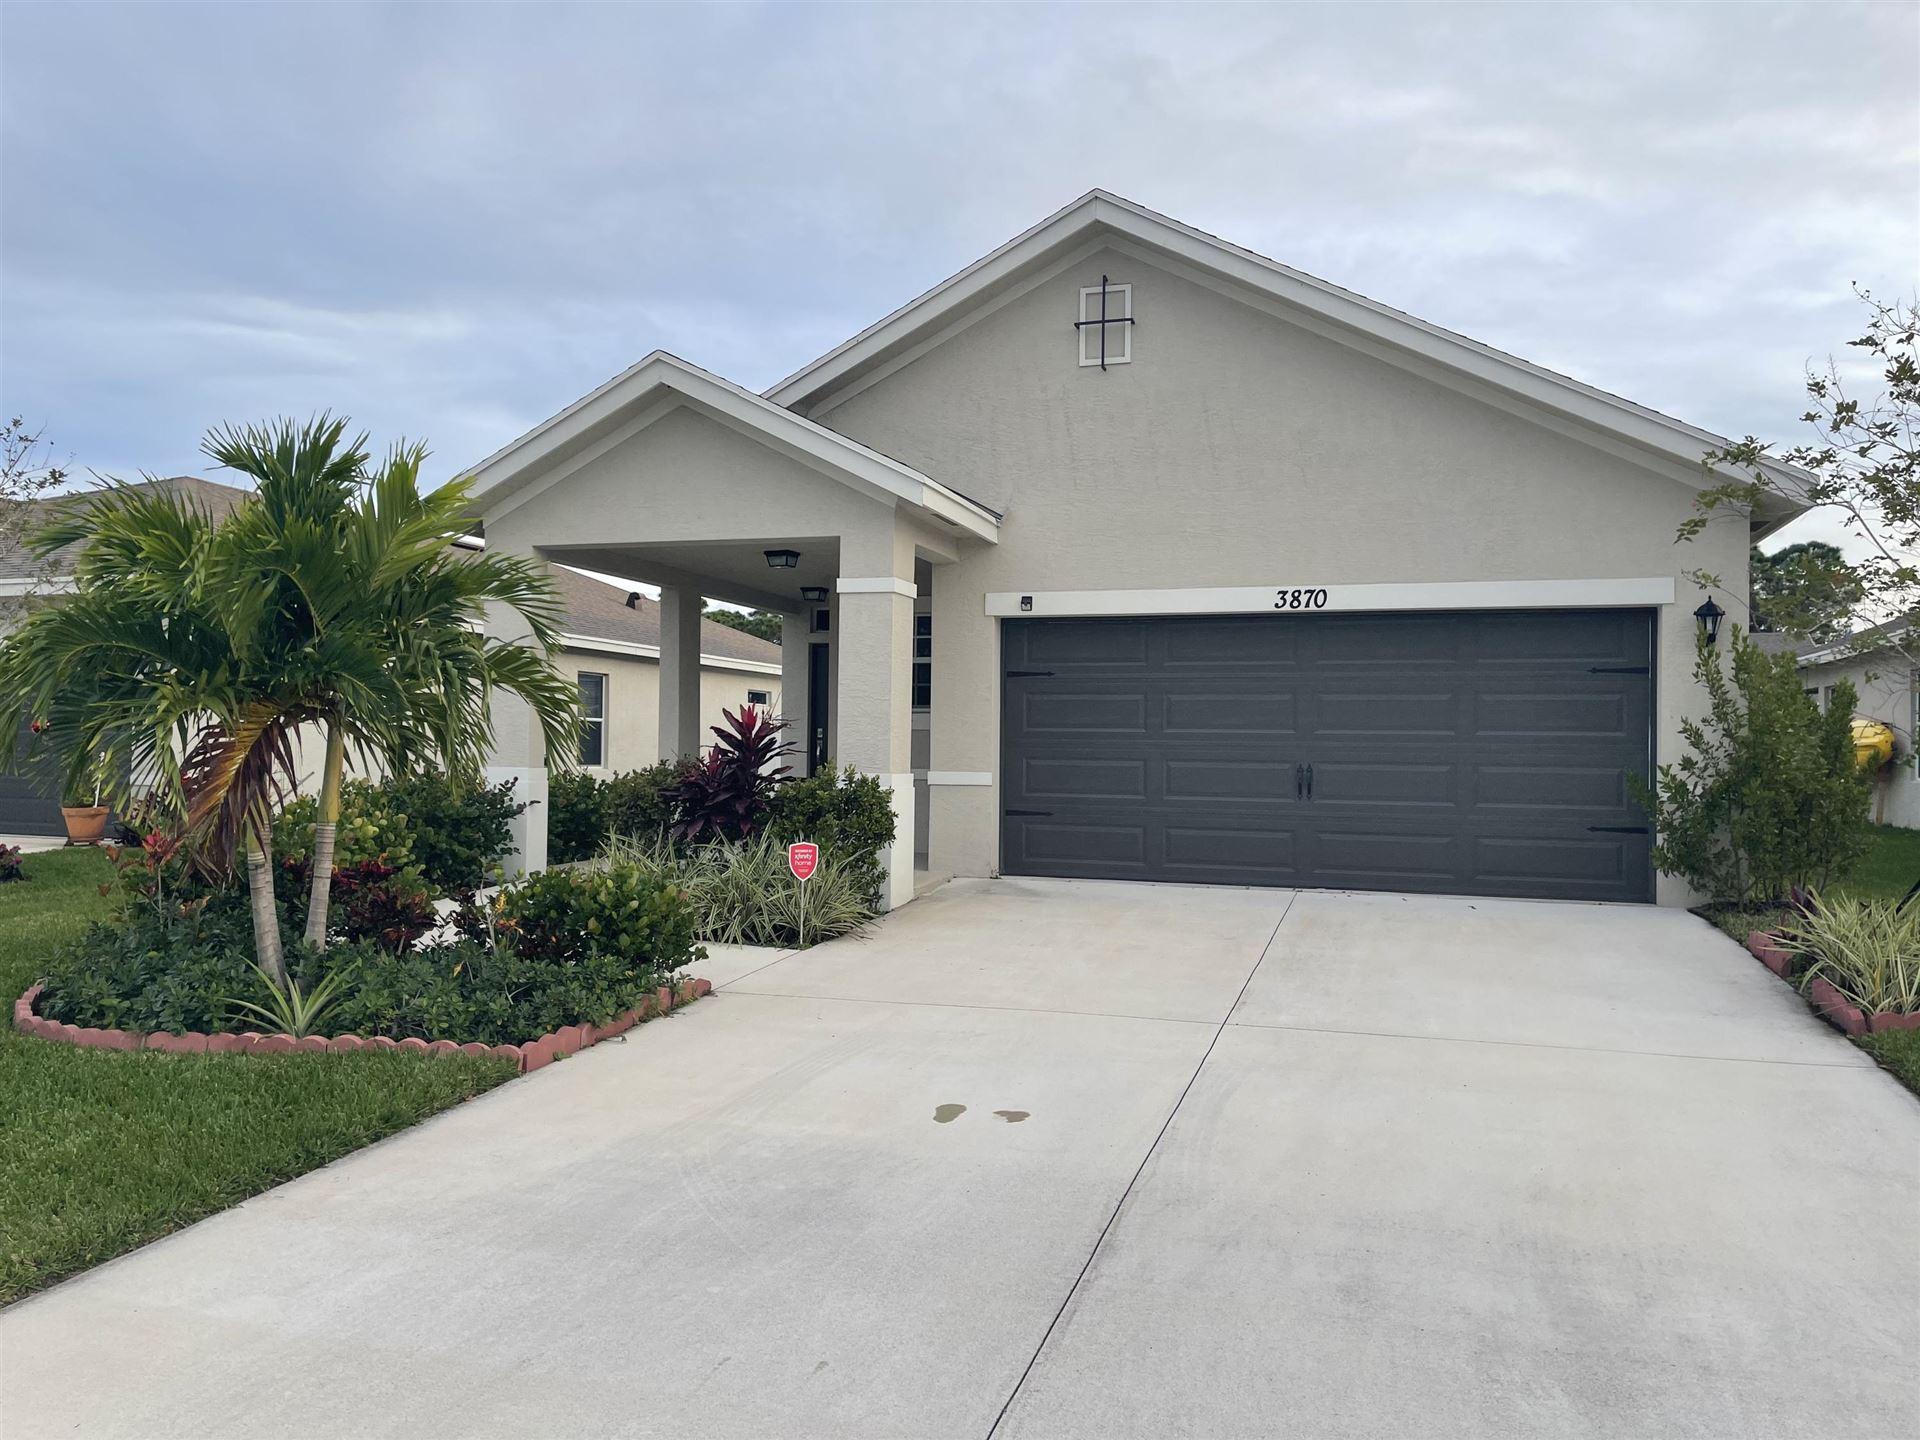 3870 SE Lee Street, Stuart, FL 34997 - #: RX-10679322